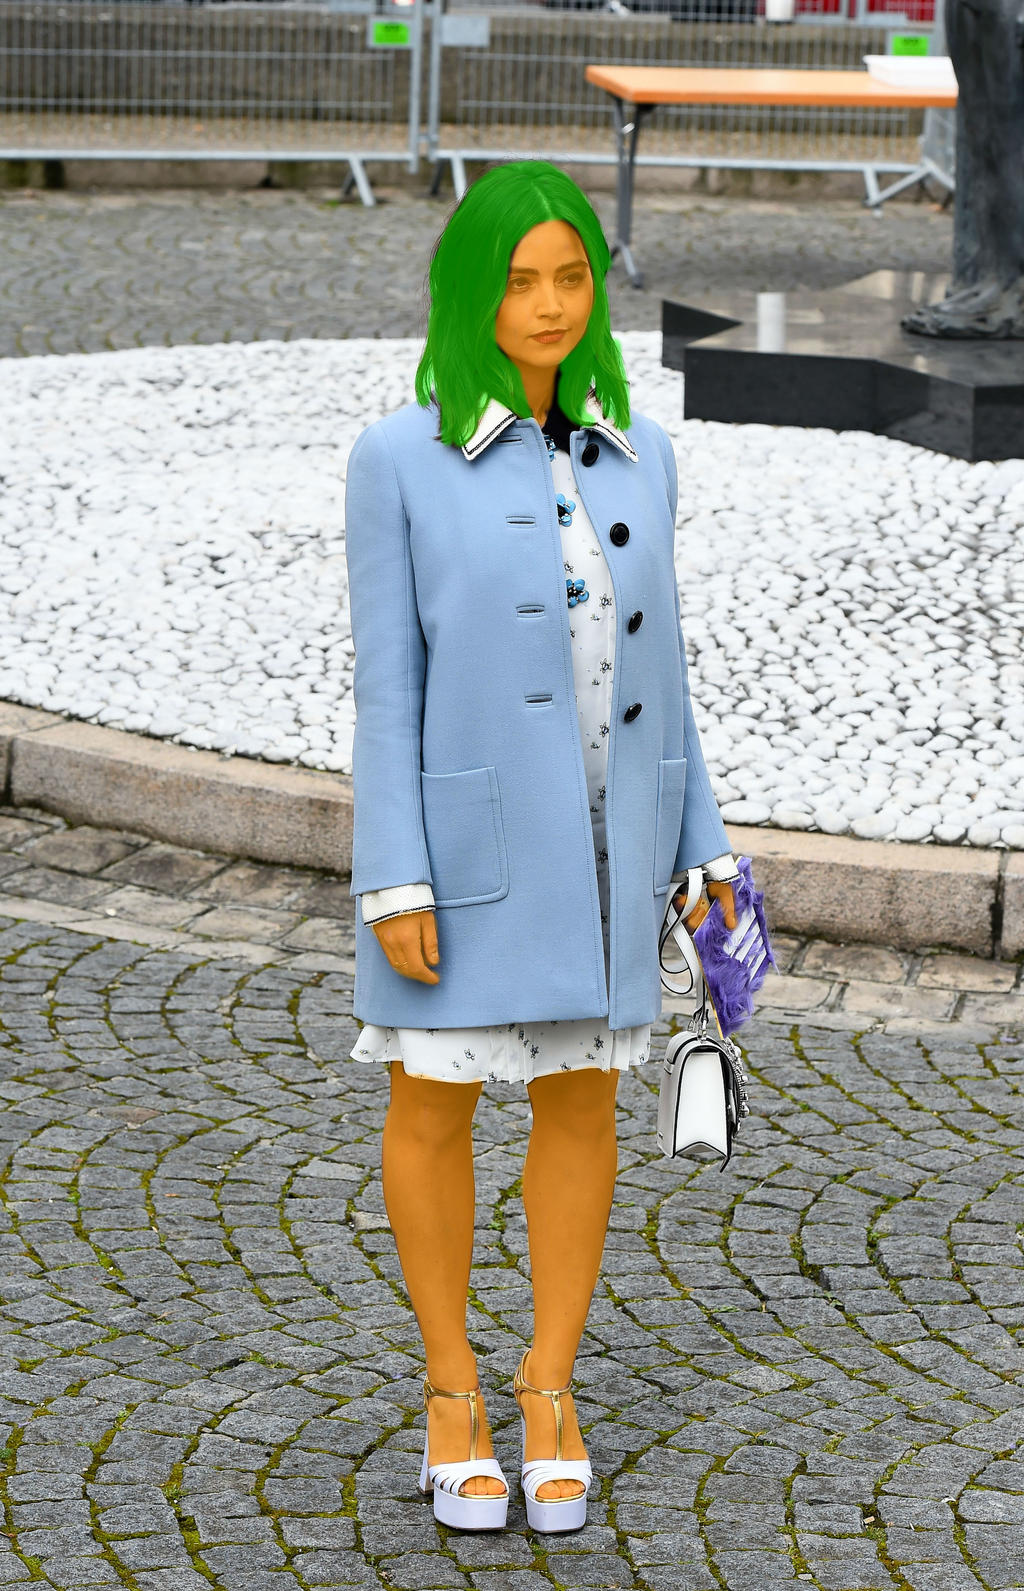 Loompa Girl Jenna Coleman by scotishjoker1edits